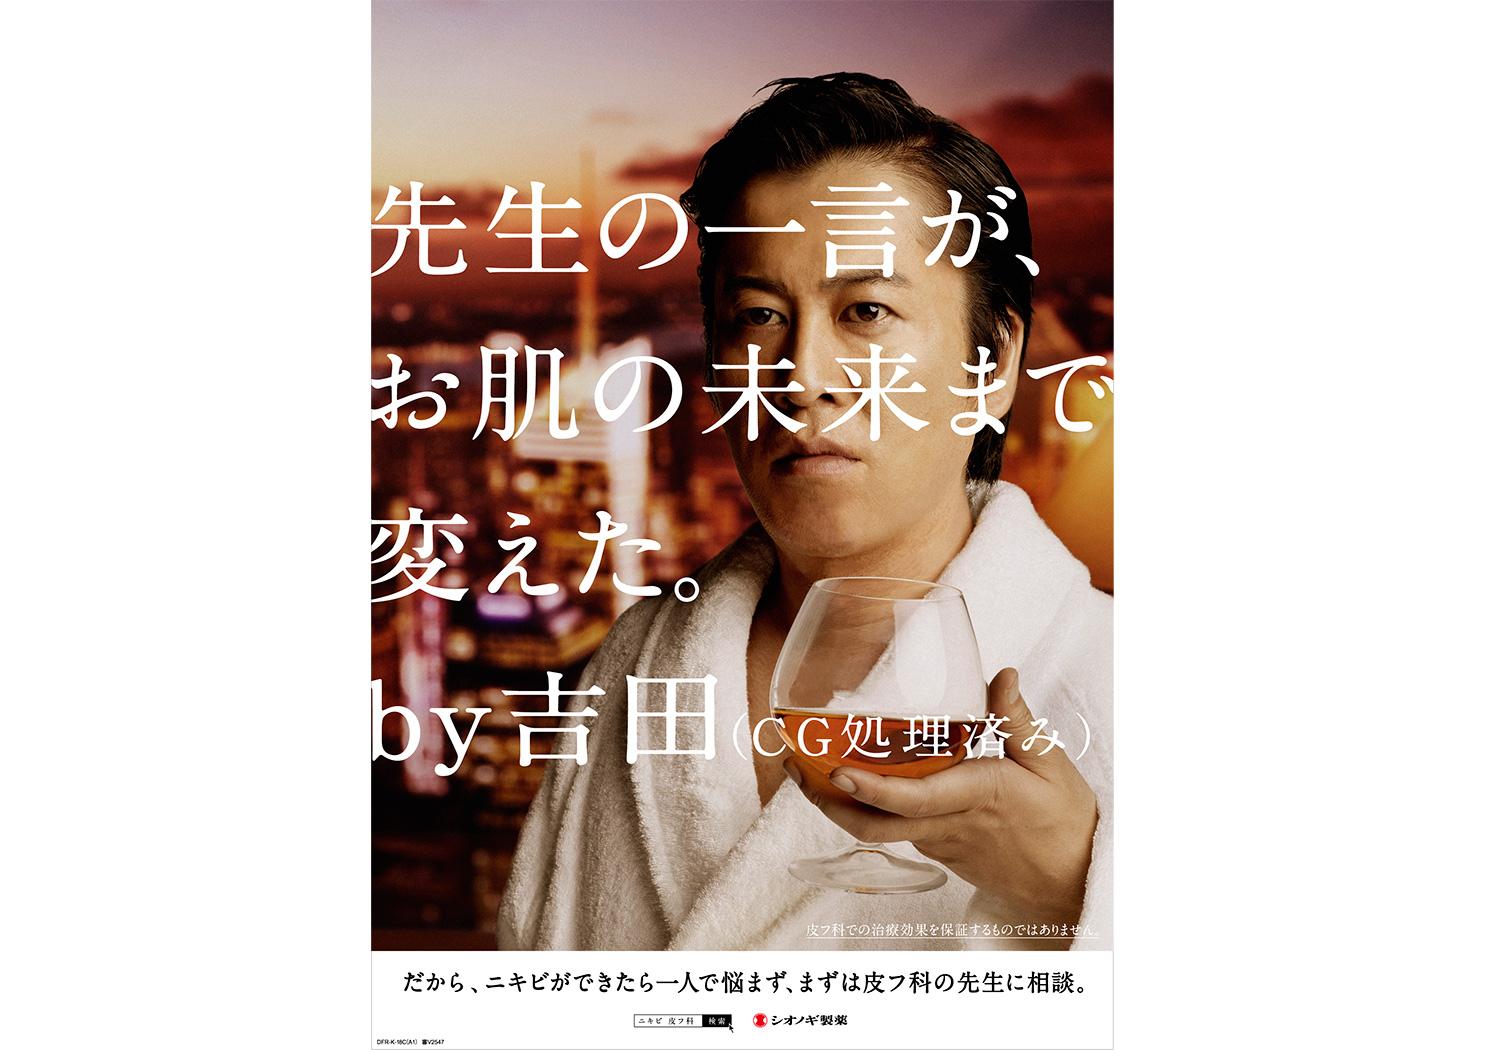 Shionogi Nikibi